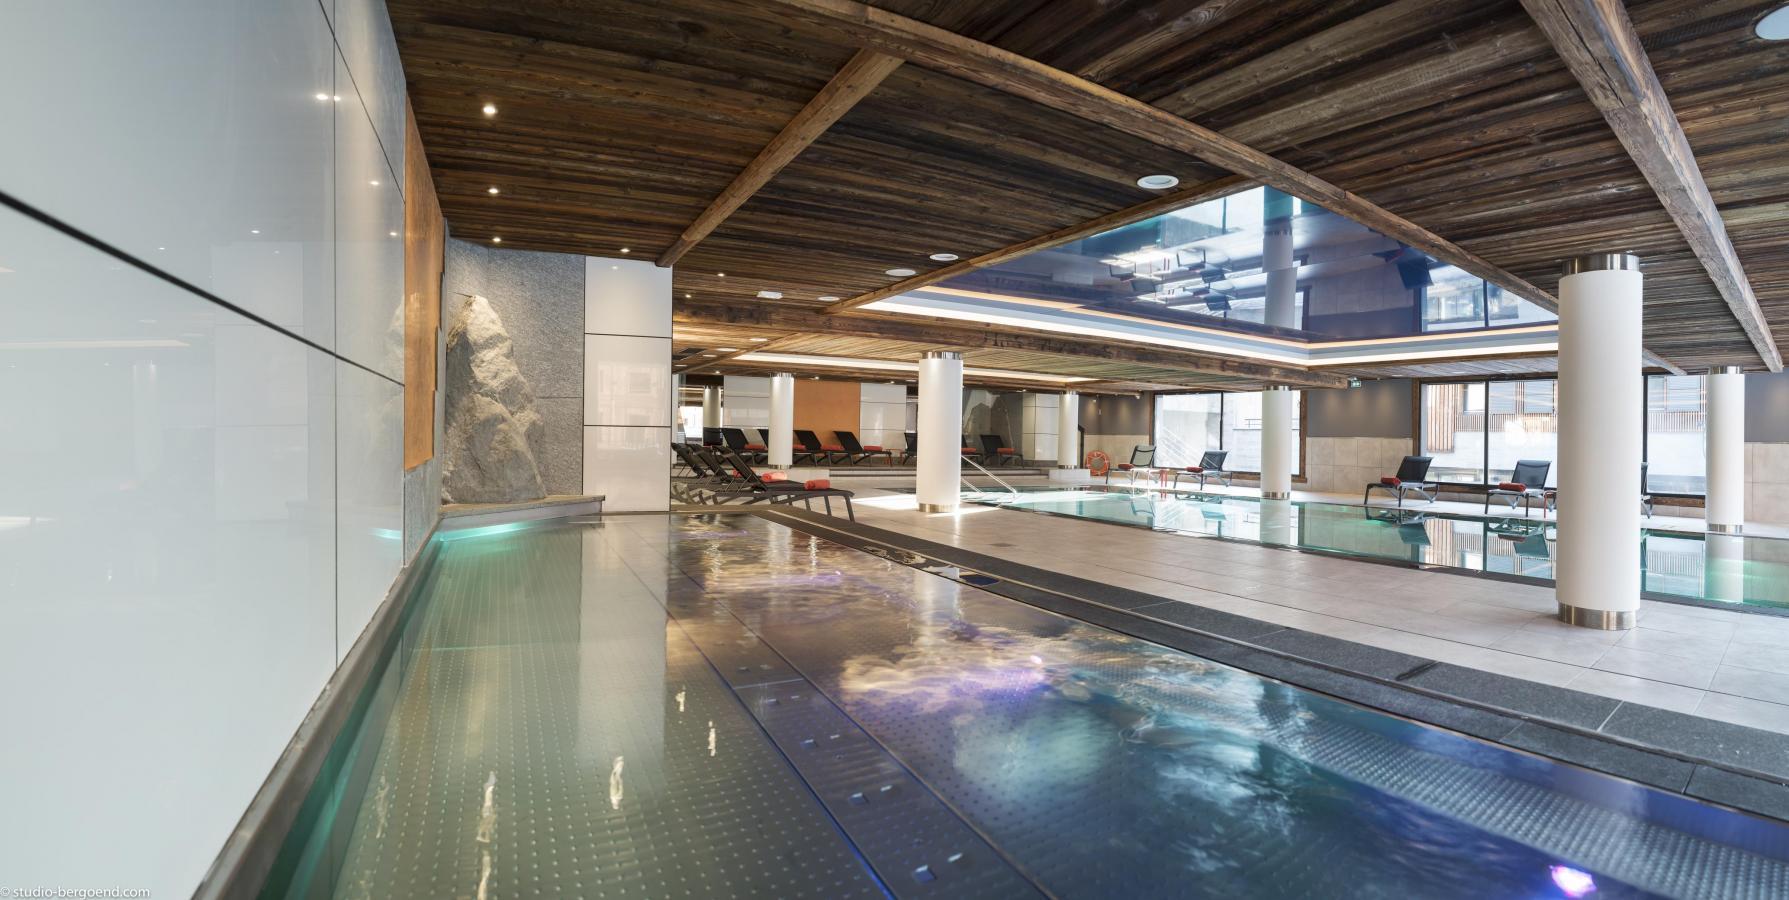 Residence le cristal de jade 10 chamonix location for Chamonix piscine